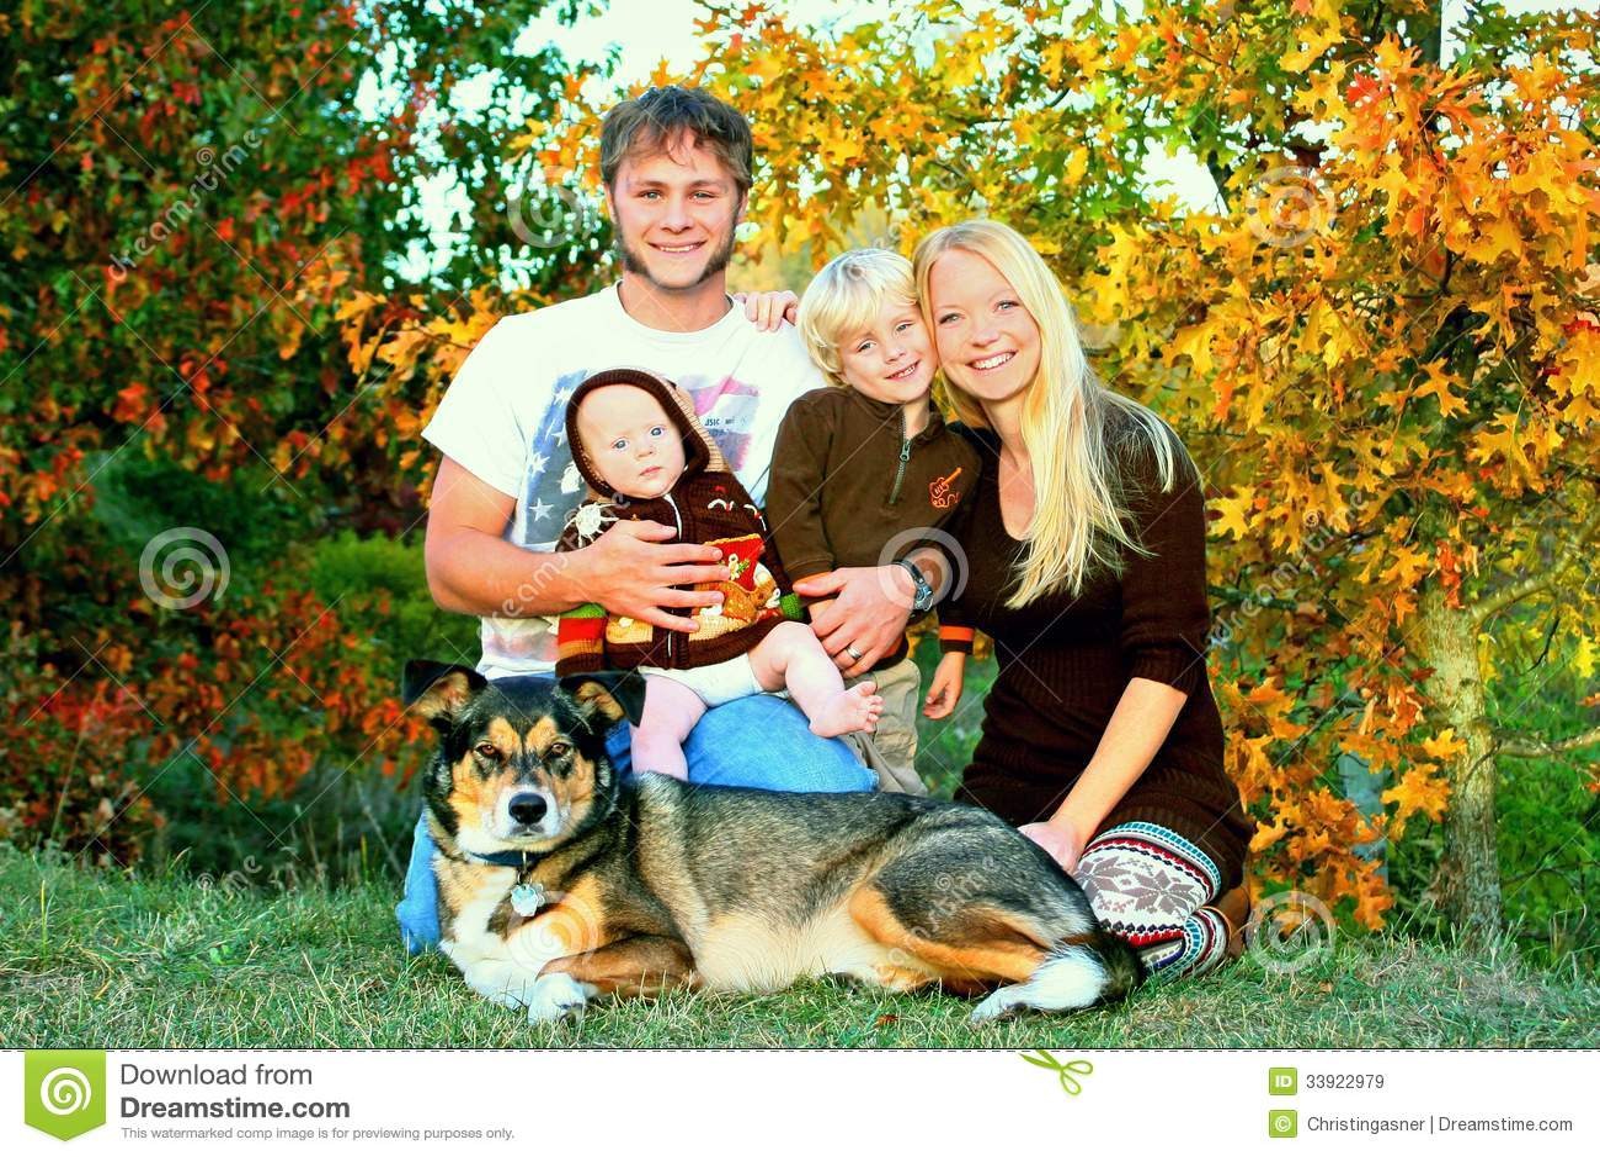 You german shepherd and kids